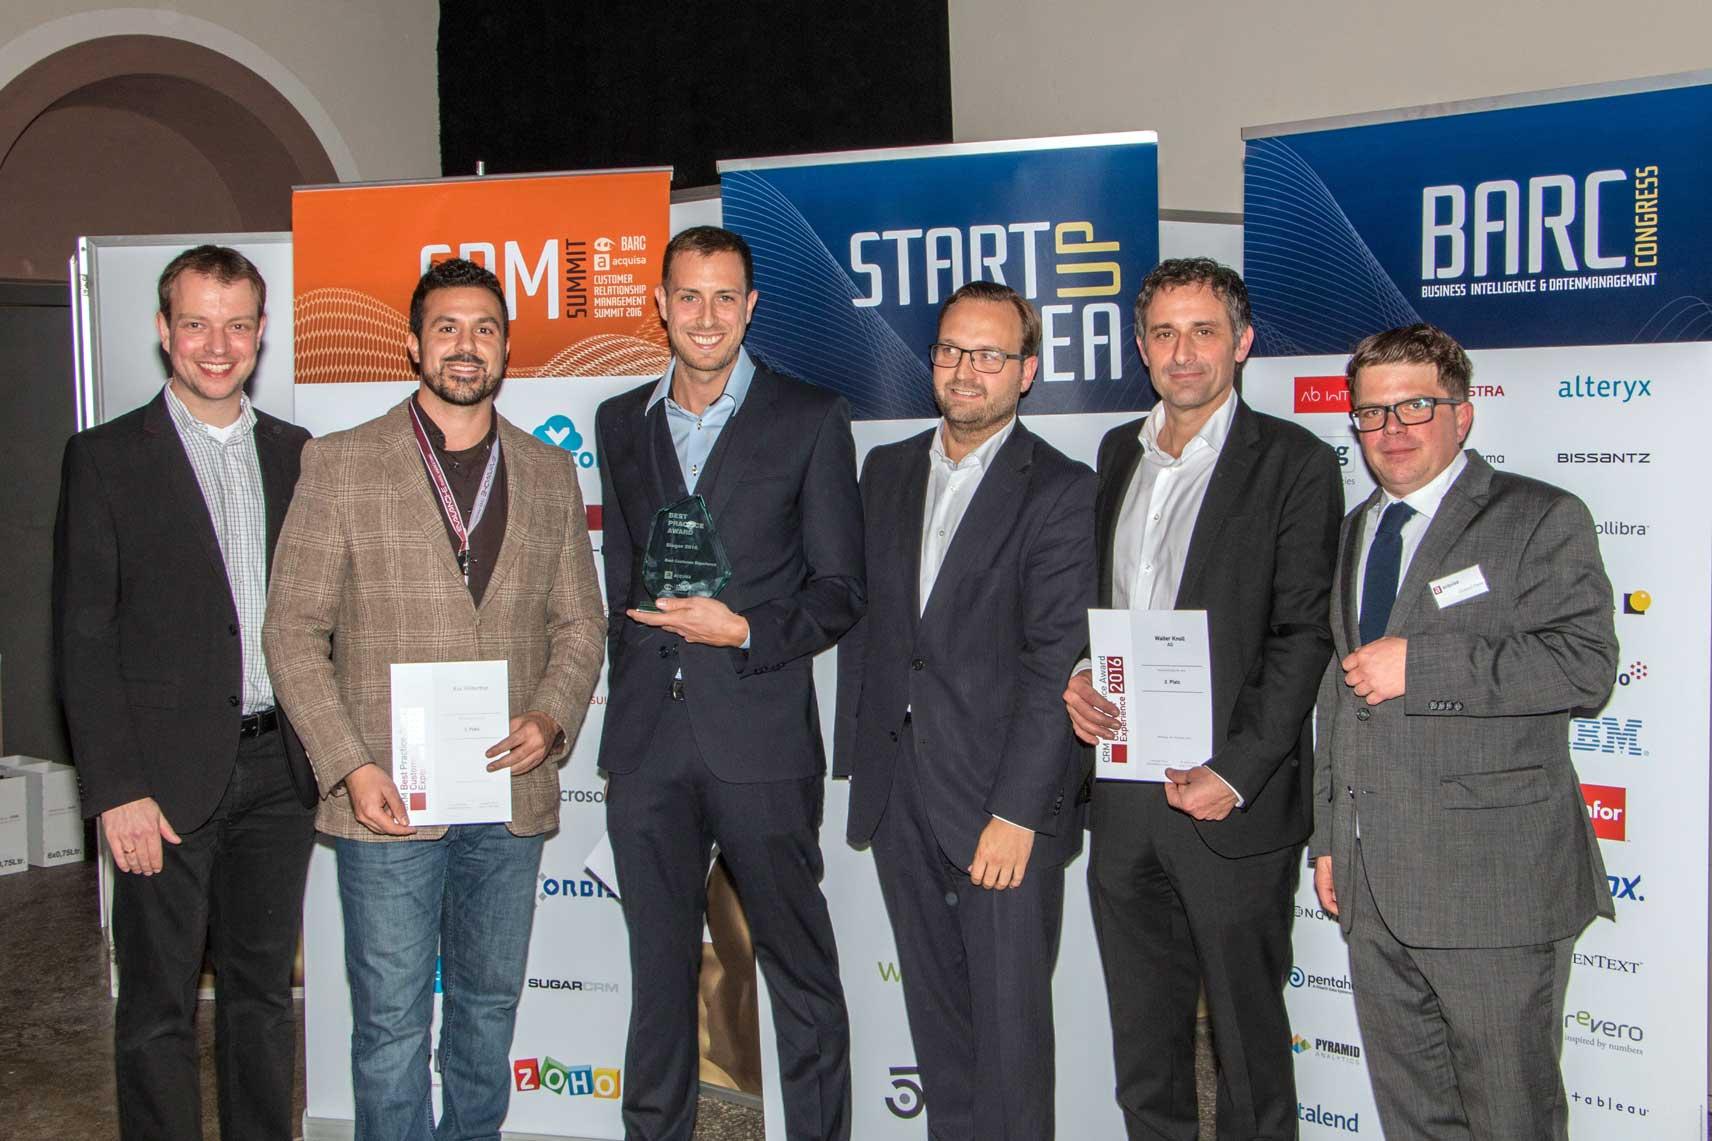 And the winners are… CRM Best Practice Award 2016 für AXA Winterthur